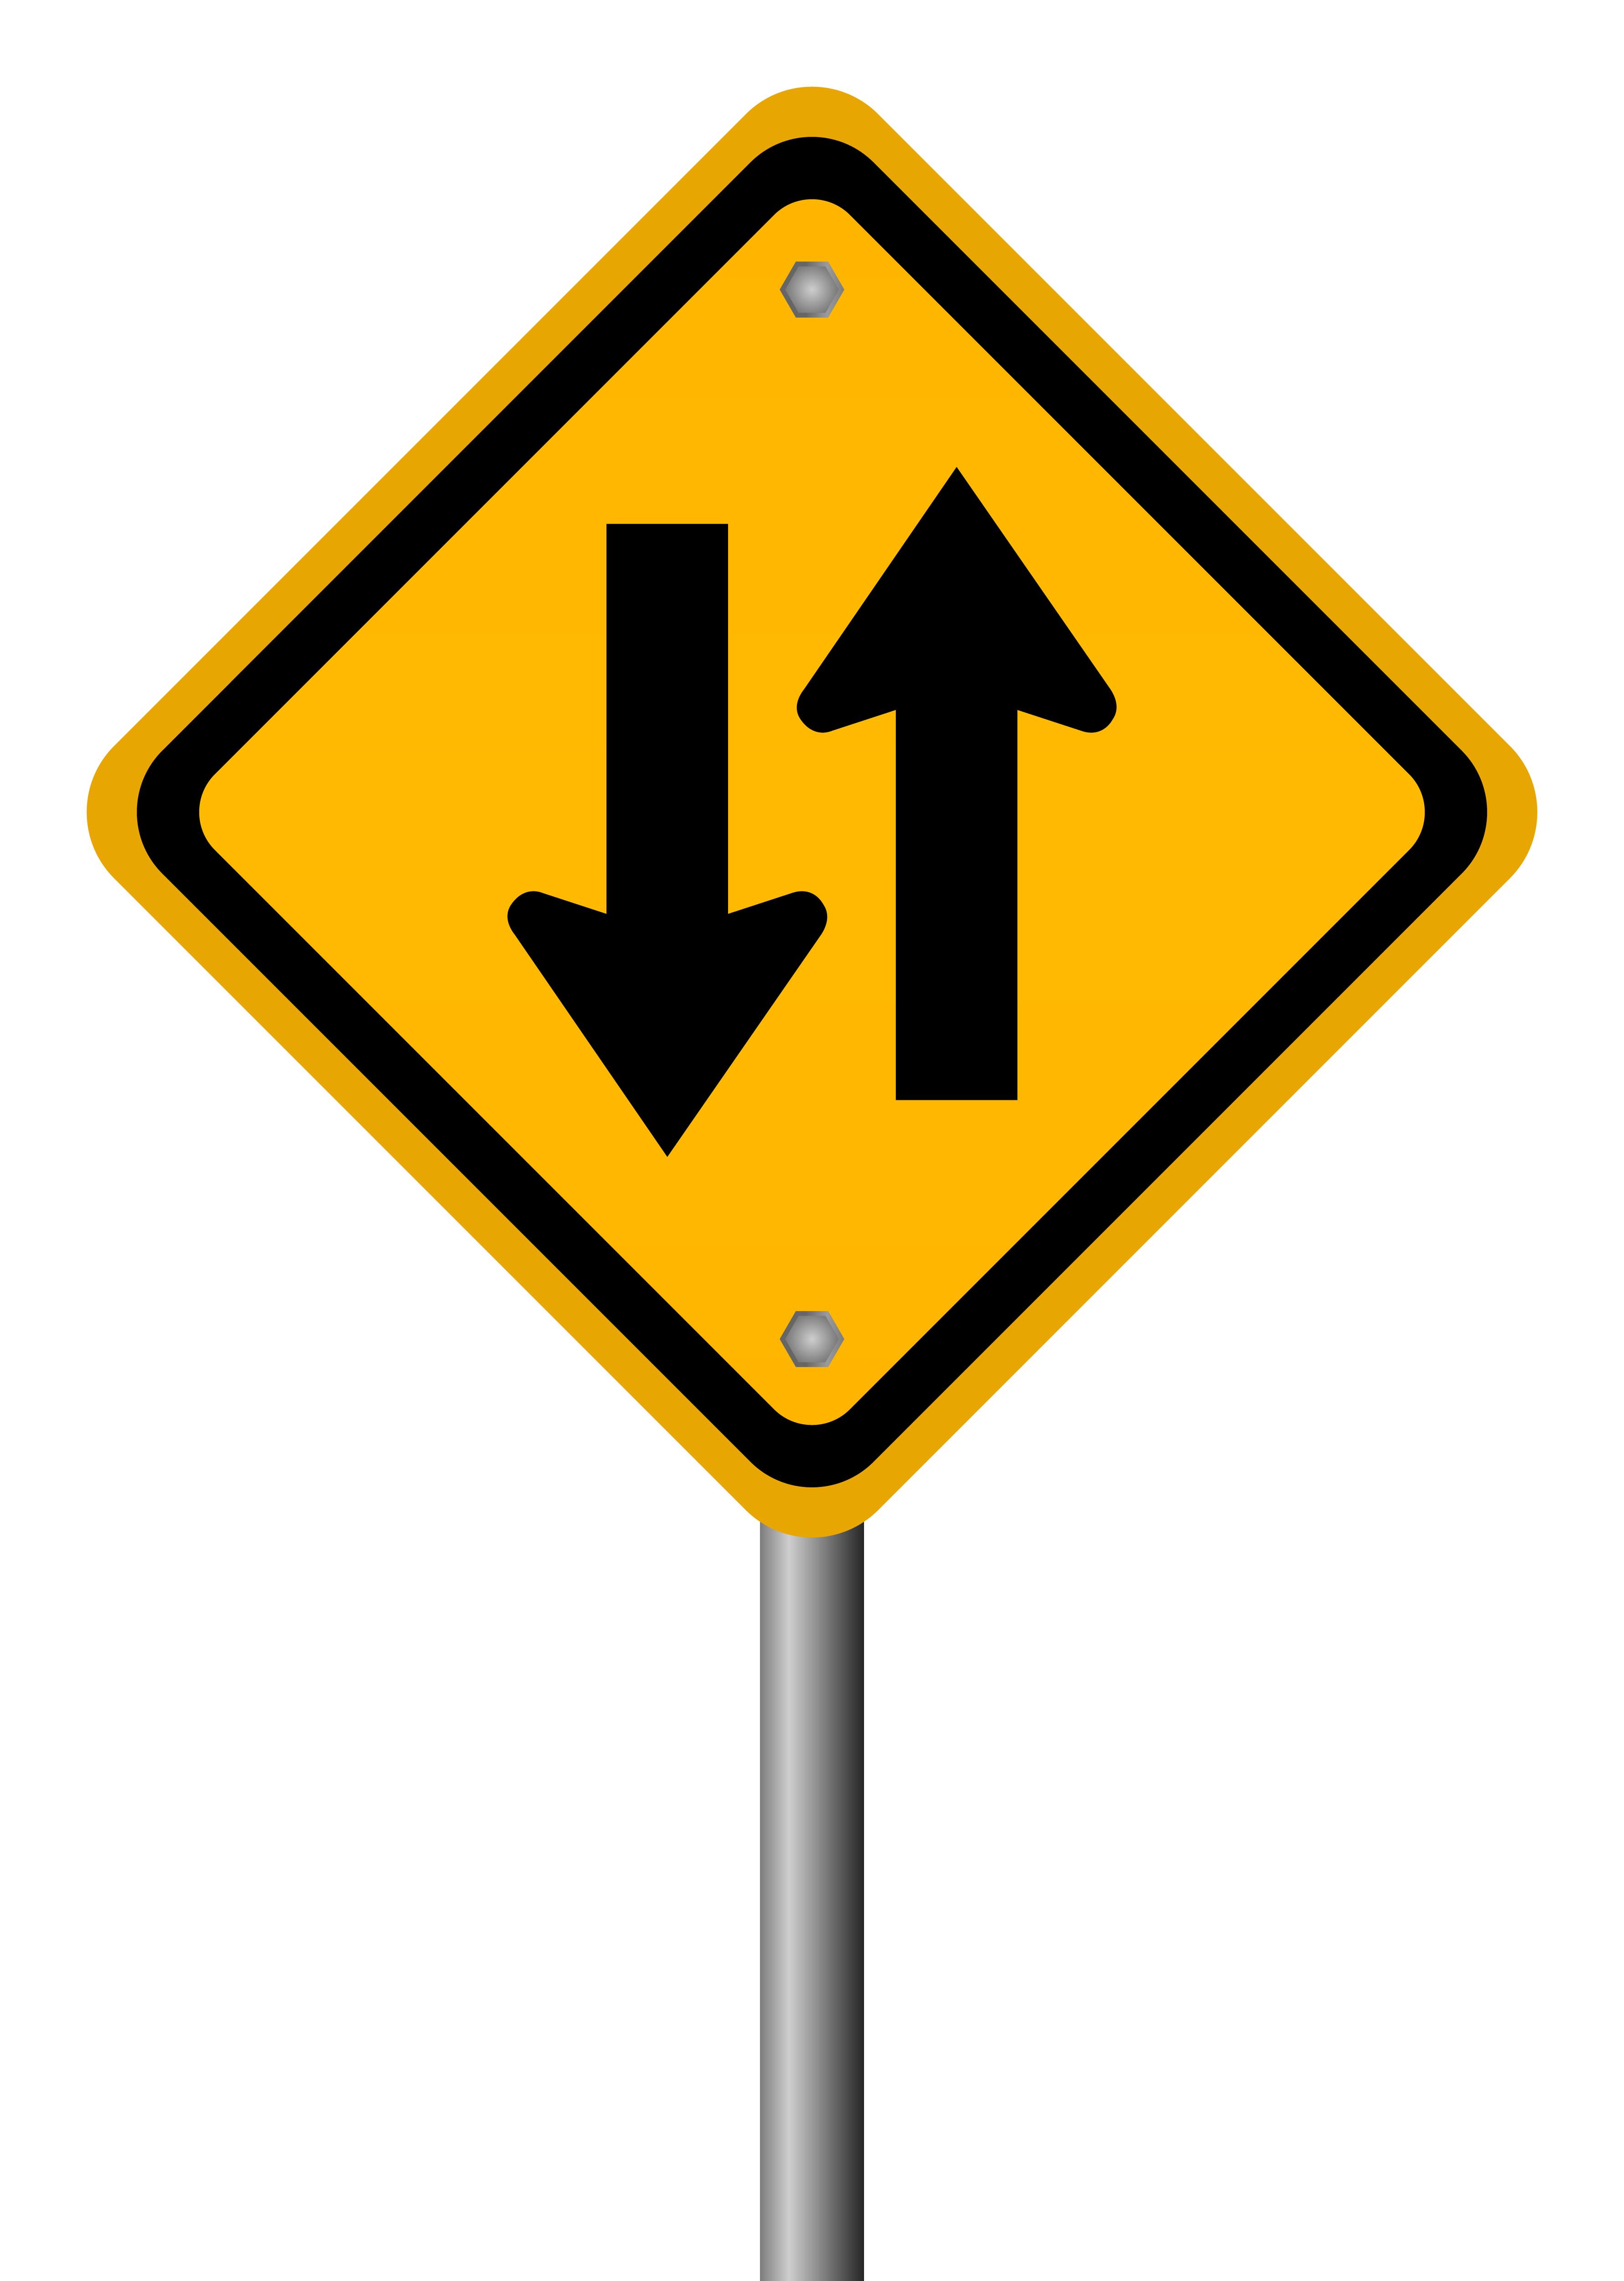 two way arrow road sign - Boomers' Social Media Tutor